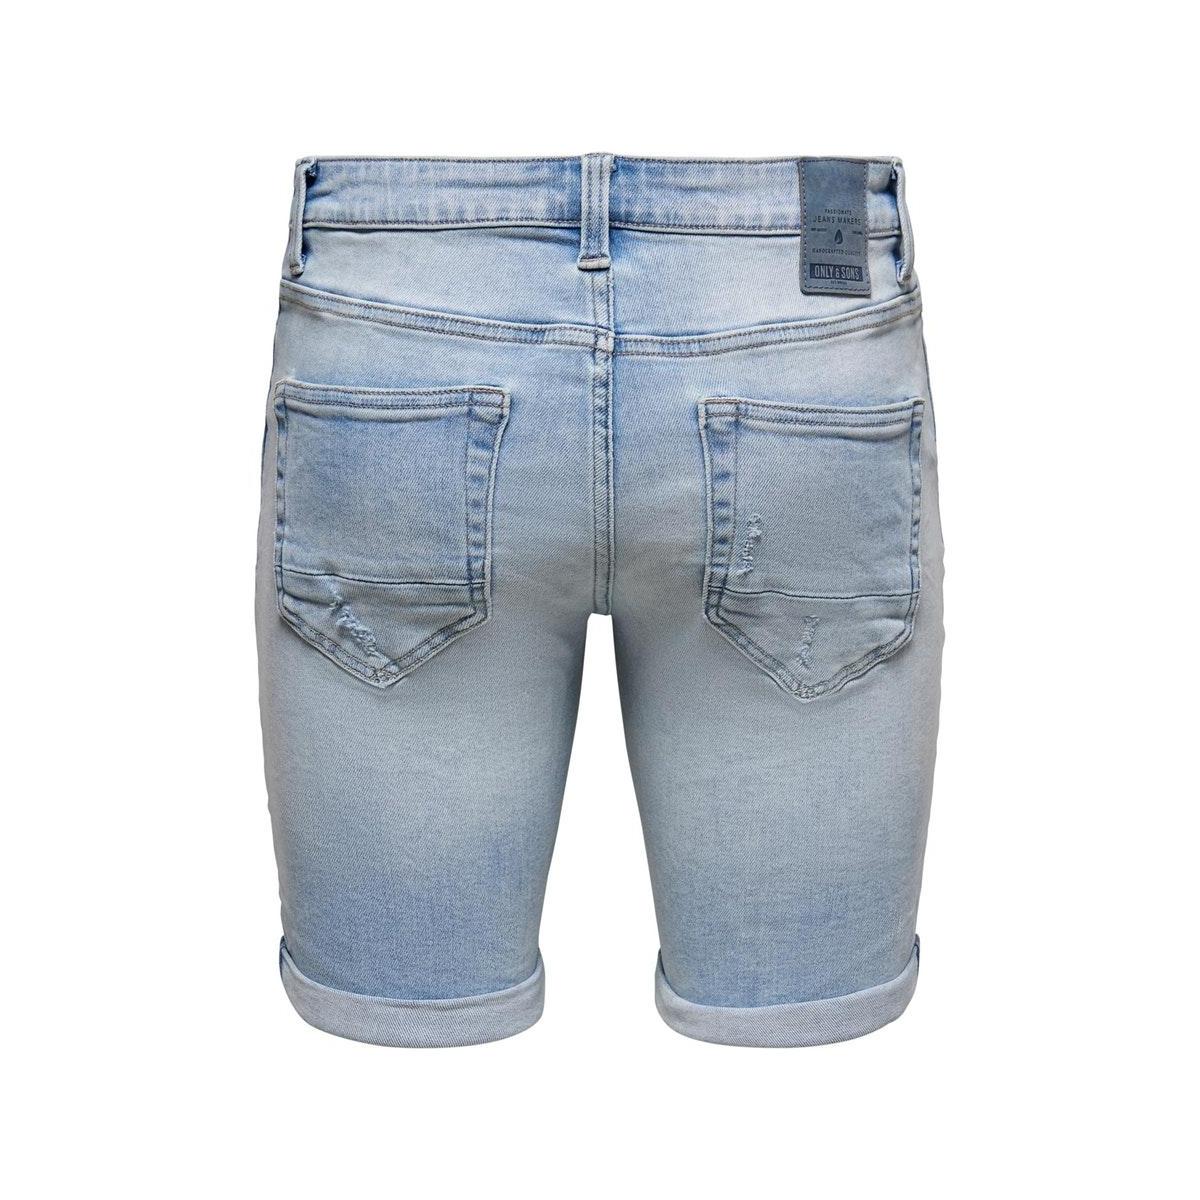 onsply reg life l blue ld pk 554 22015541 only & sons korte broek blue denim